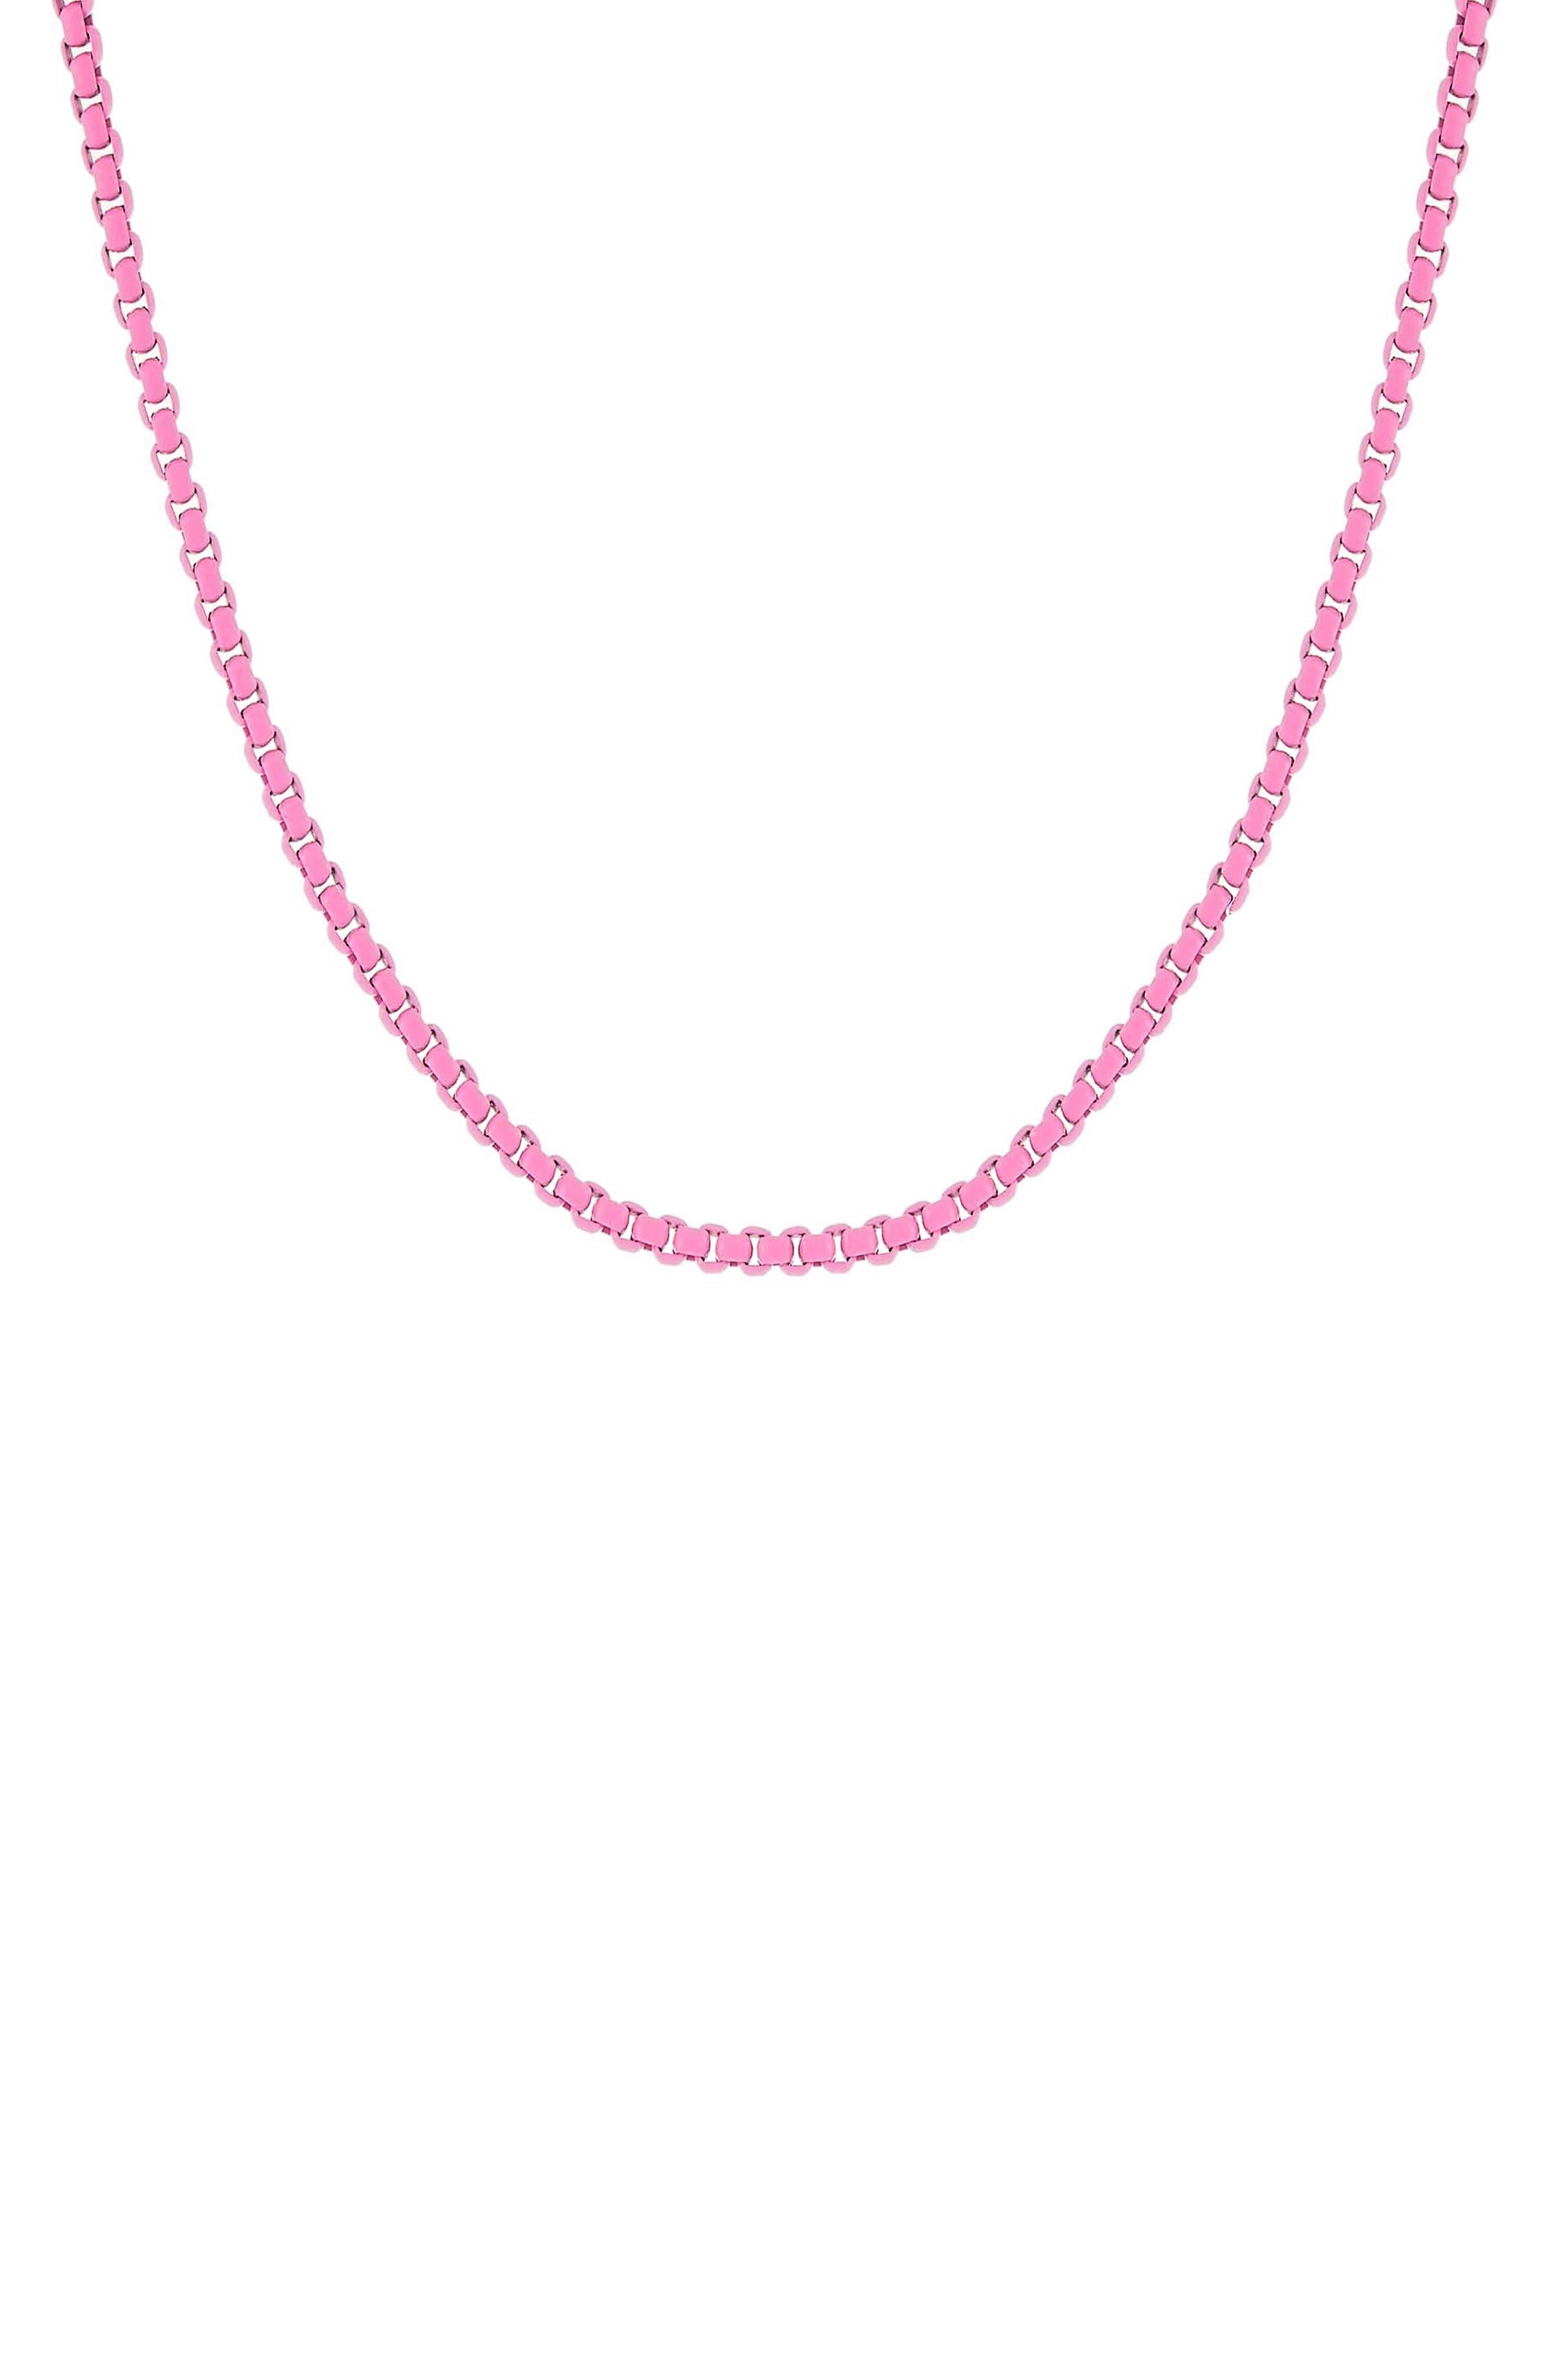 Women's Adina's Jewels Enamel Rope Chain Necklace